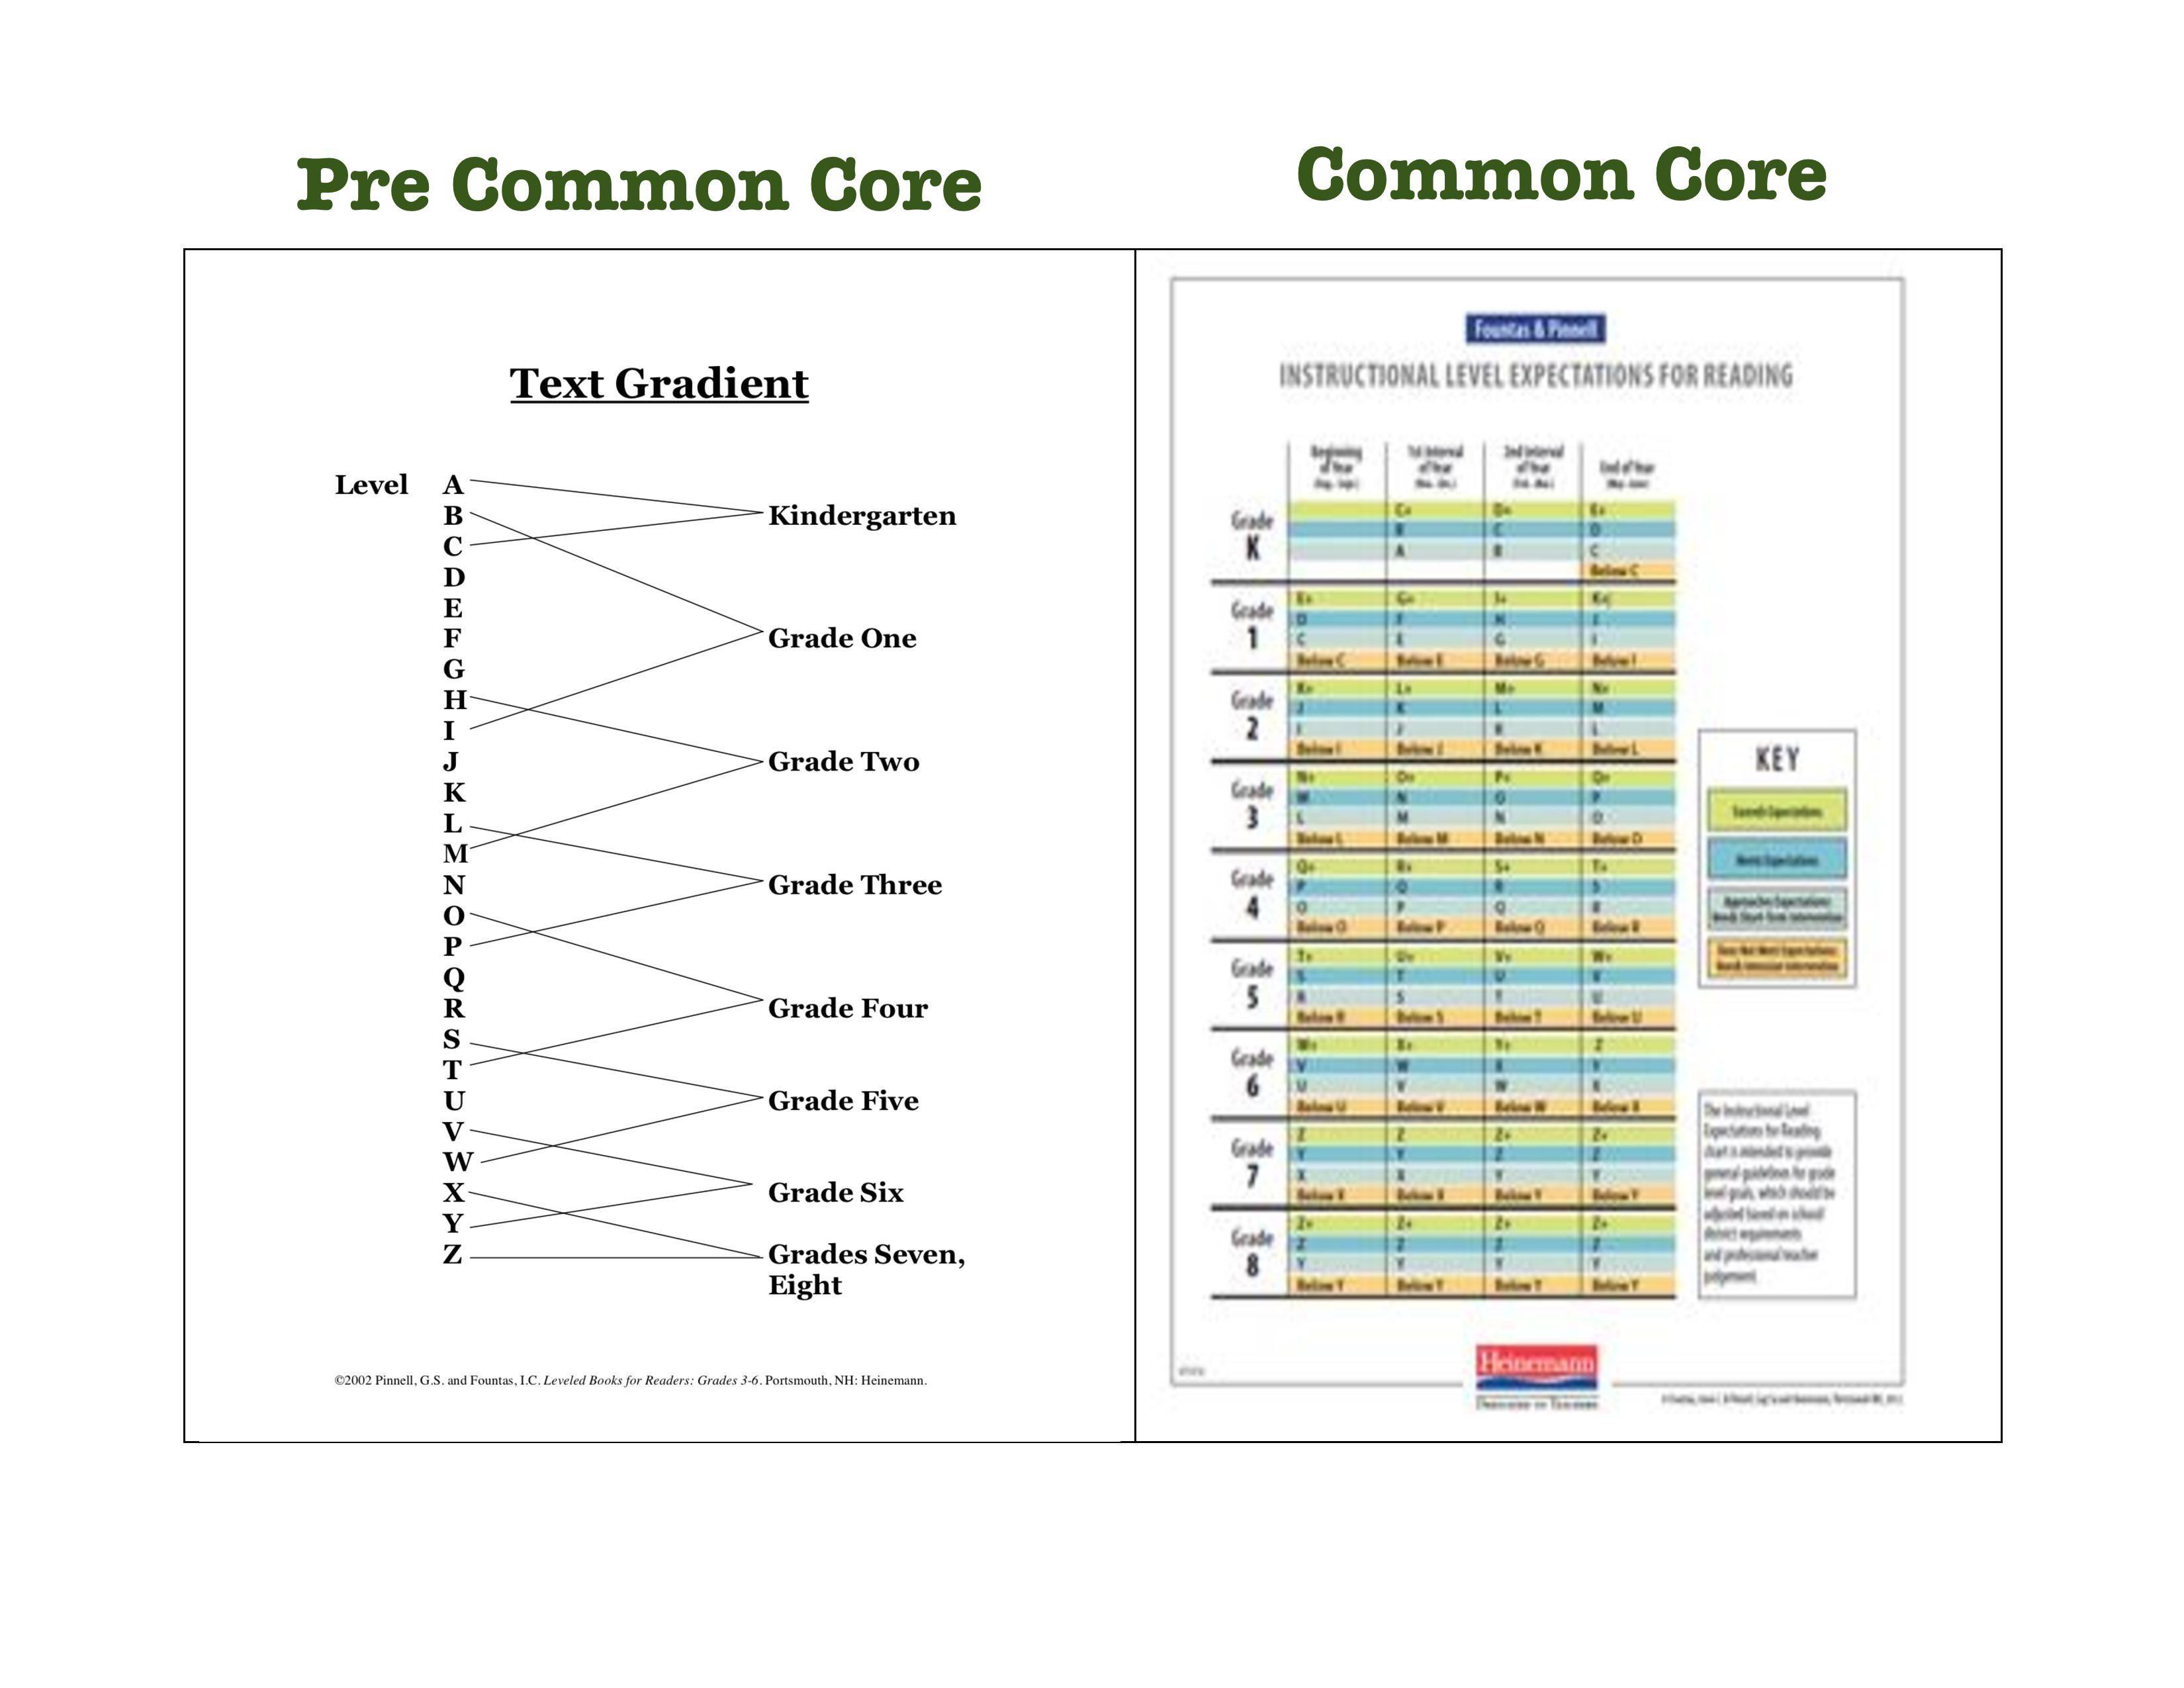 Fountas Pinnell Create More Rigorous Common Core Guided Reading Guidelines Guided Reading Common Core Guided Reading Level Chart Fountas and pinnell reading level chart